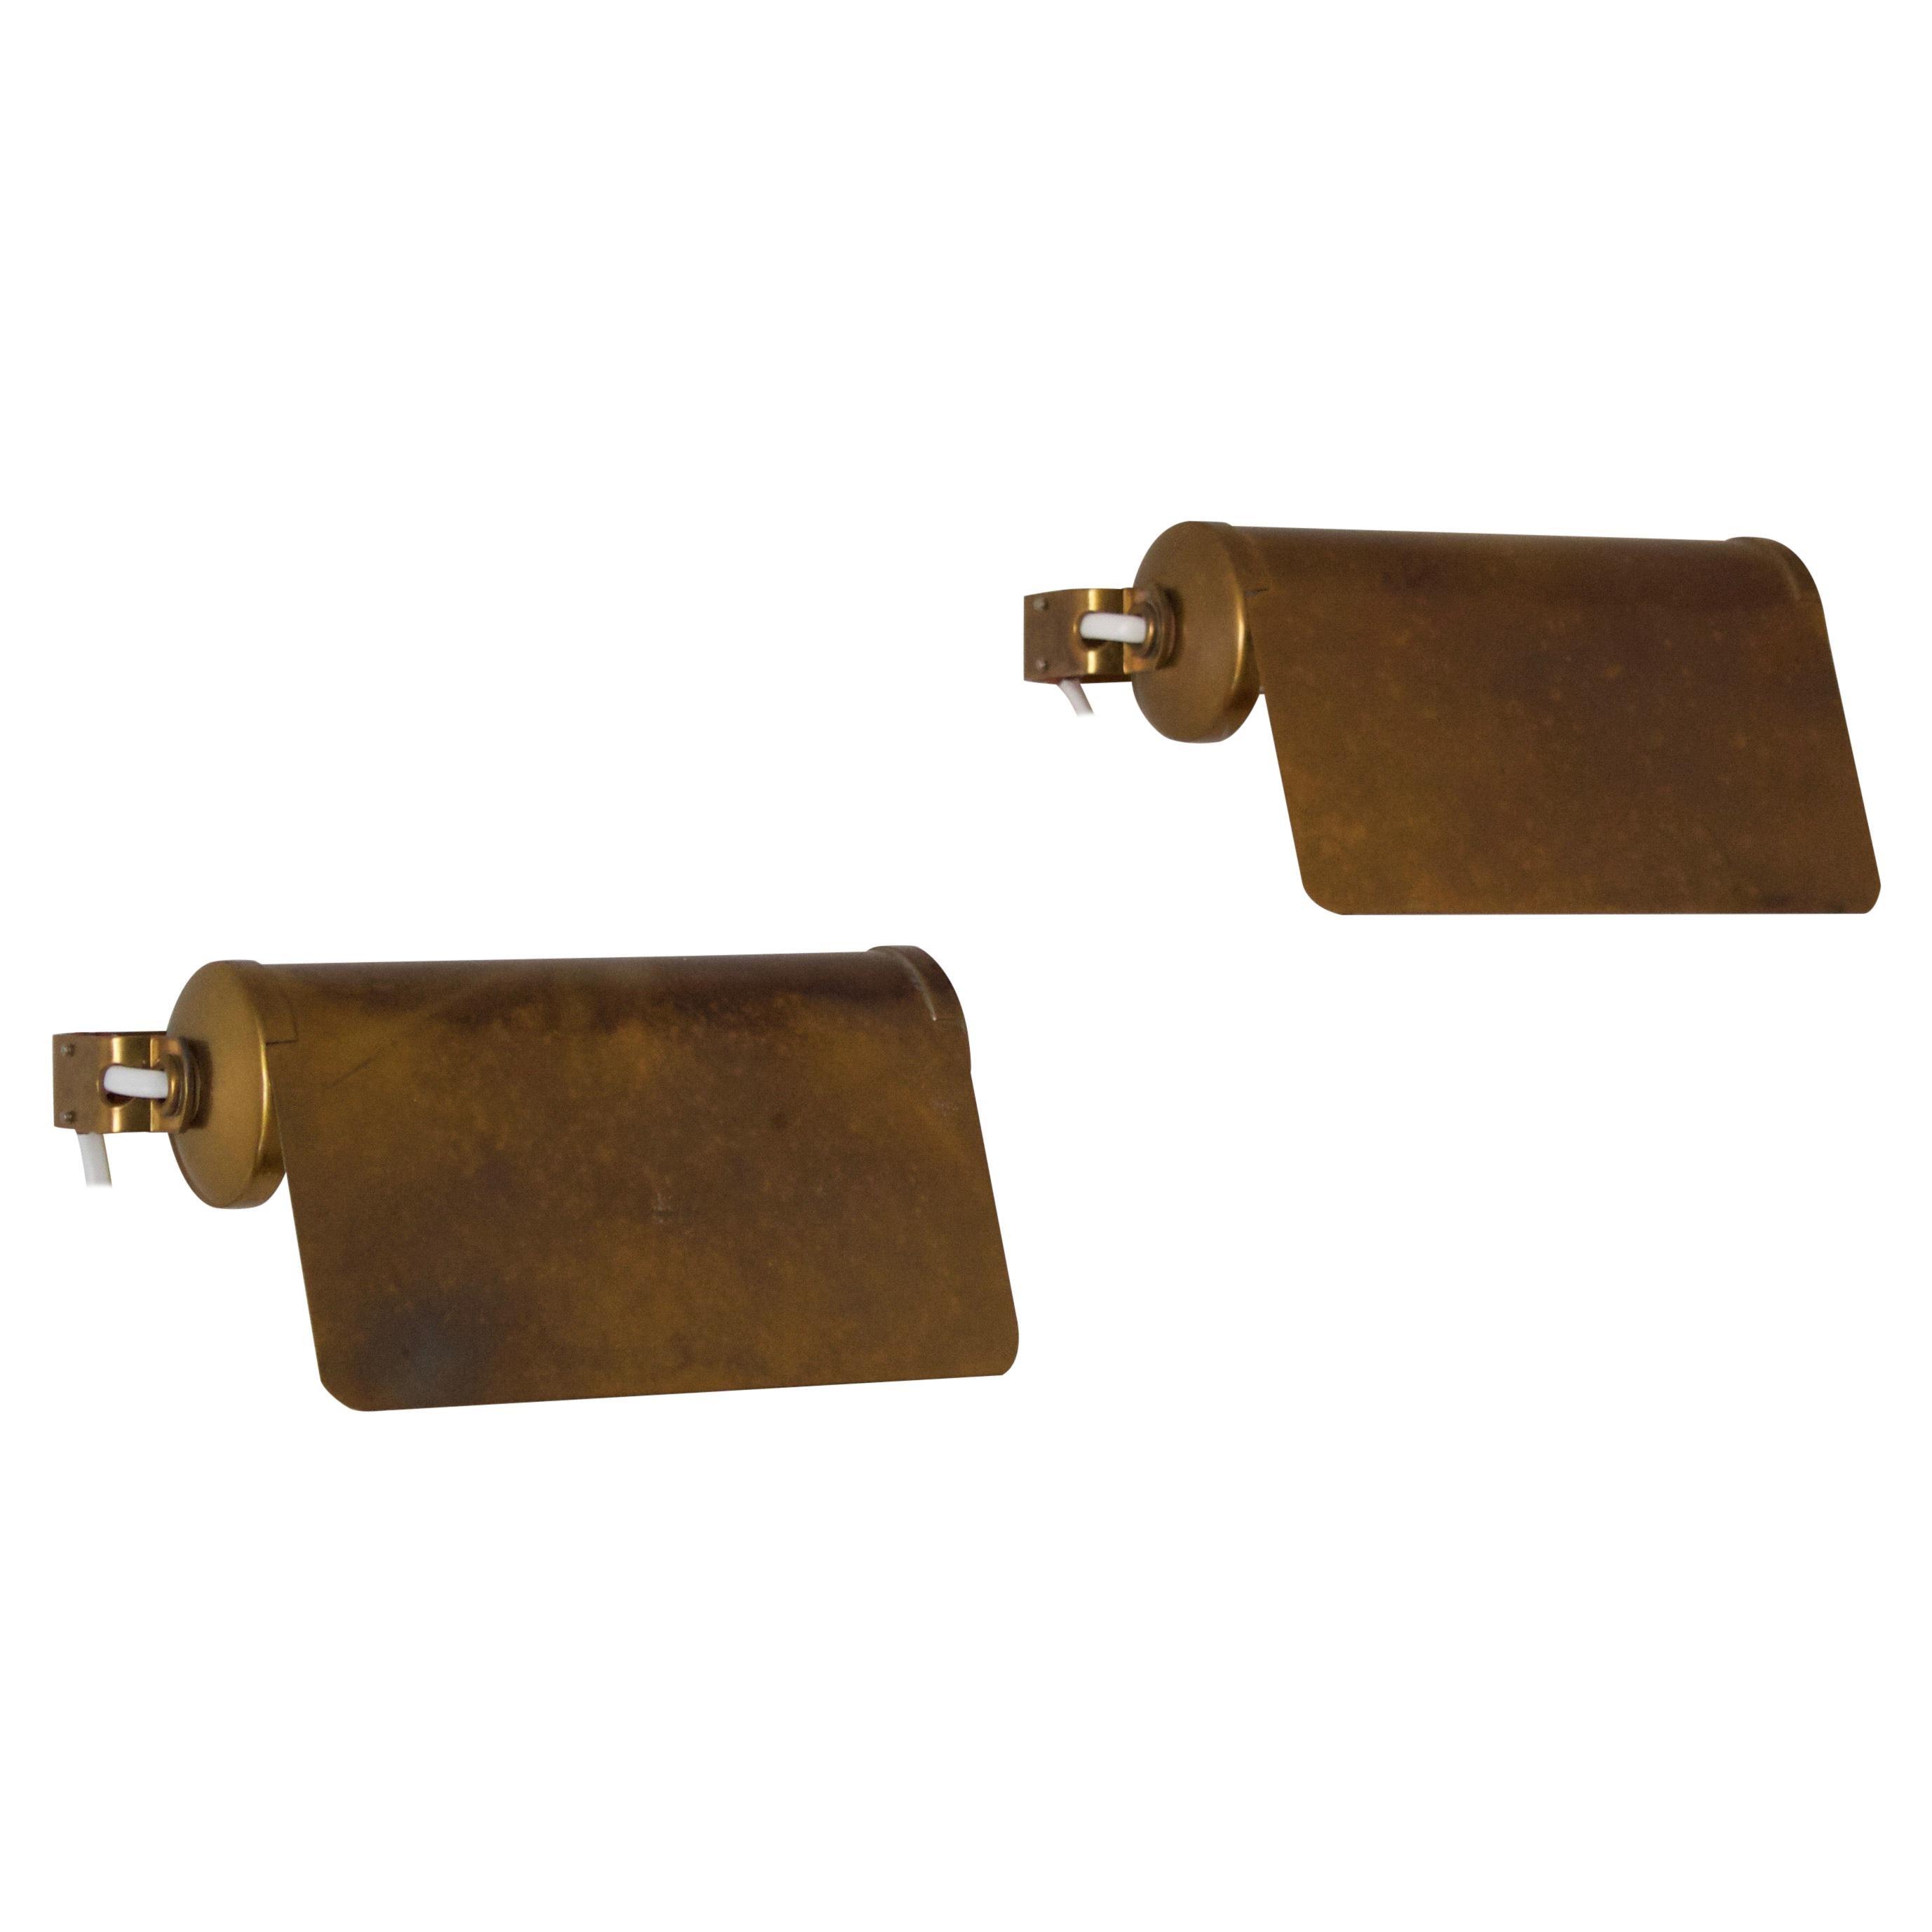 ASEA, Adjustable Wall Light, Brass, Sweden, 1940s